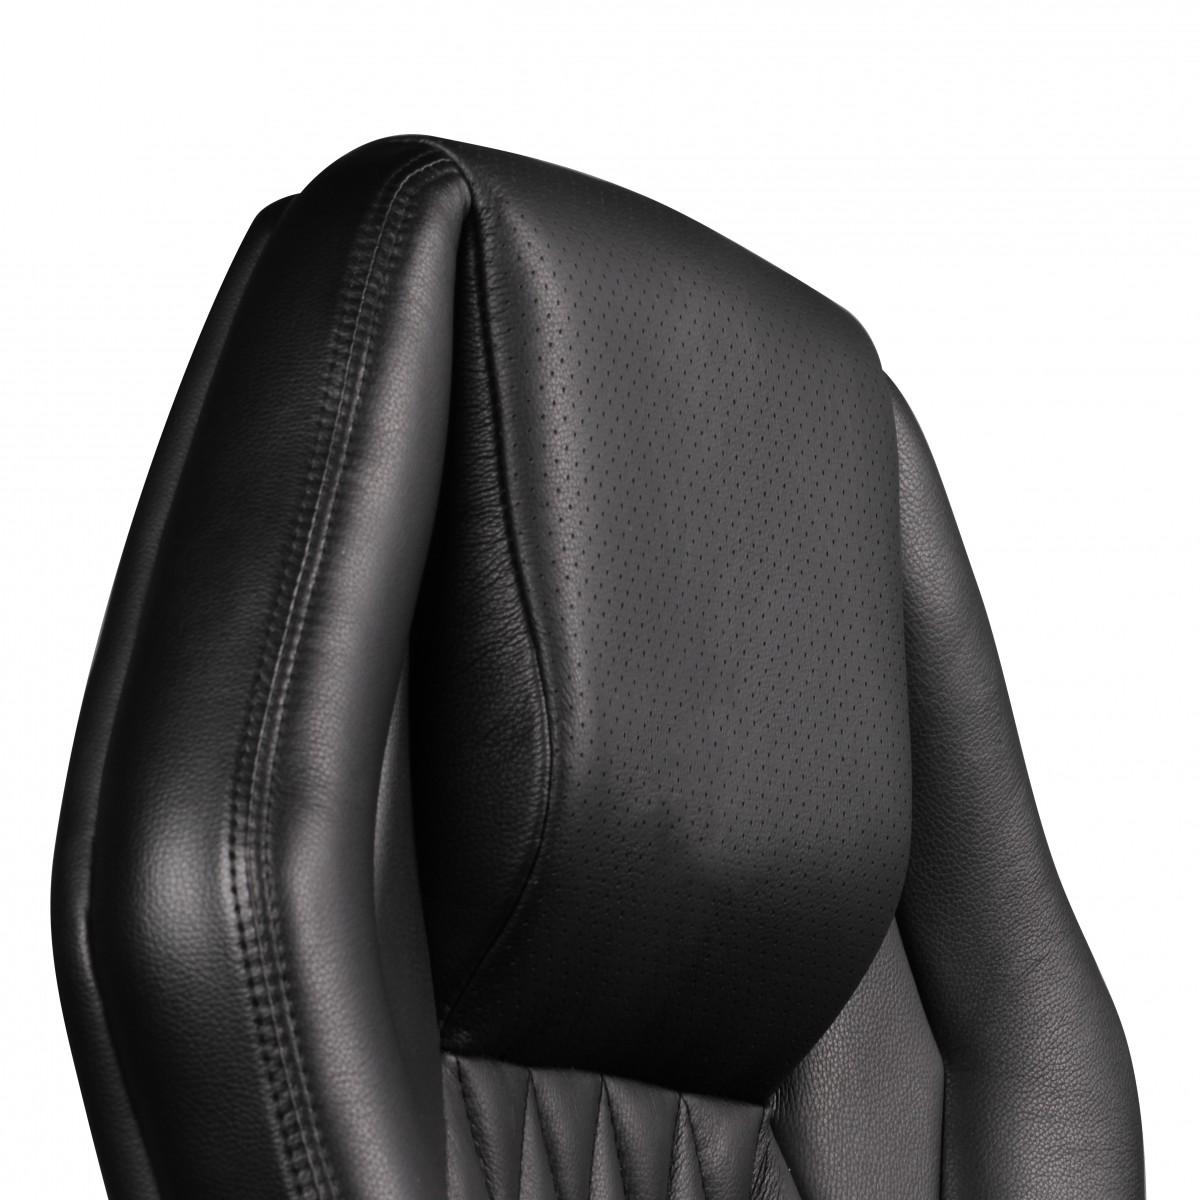 amstyle b rostuhl monterey echt leder schwarz schreibtischstuhl 120kg chefsessel hohe. Black Bedroom Furniture Sets. Home Design Ideas